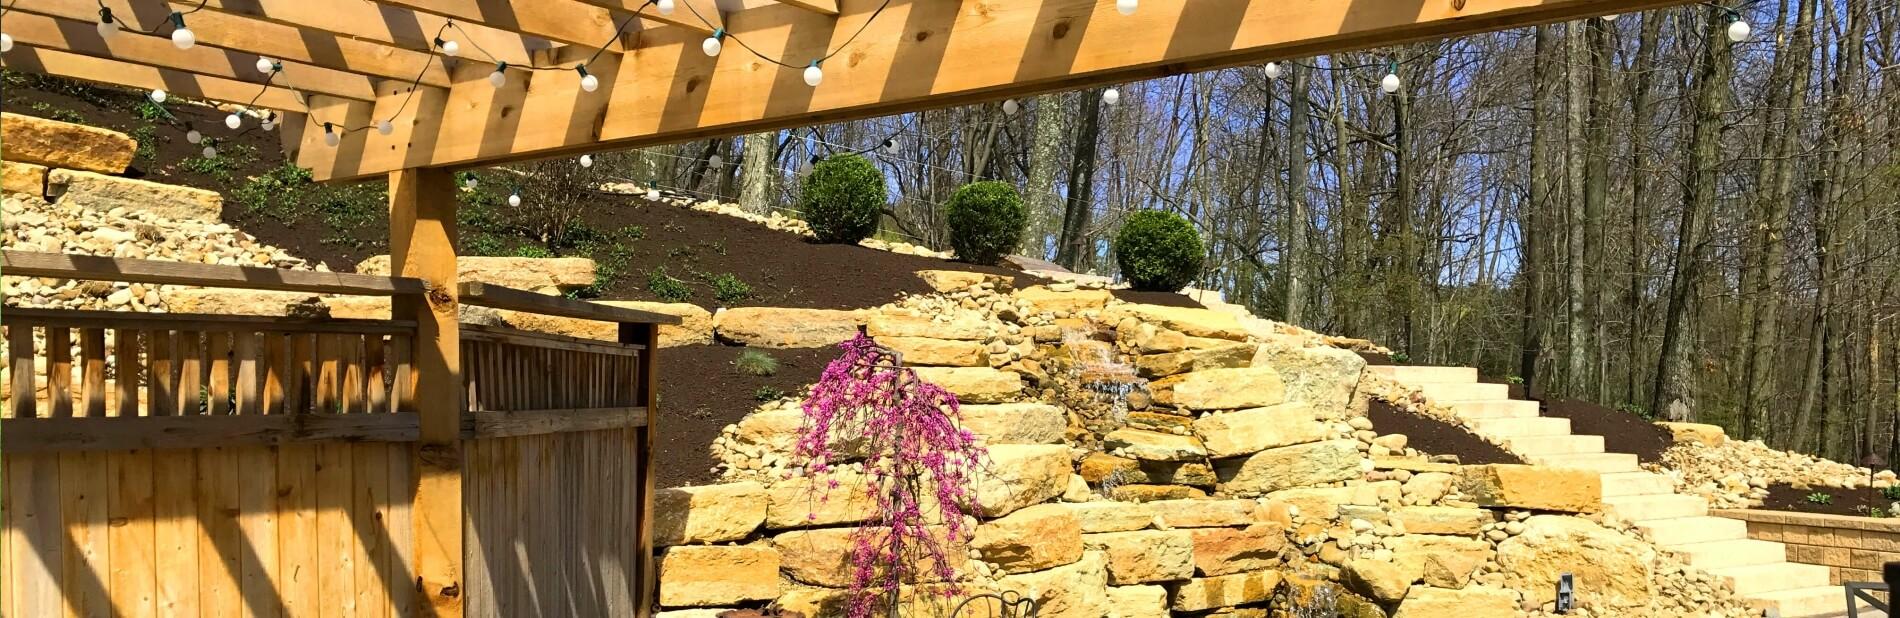 Retaining Wall Builders Pittsburgh